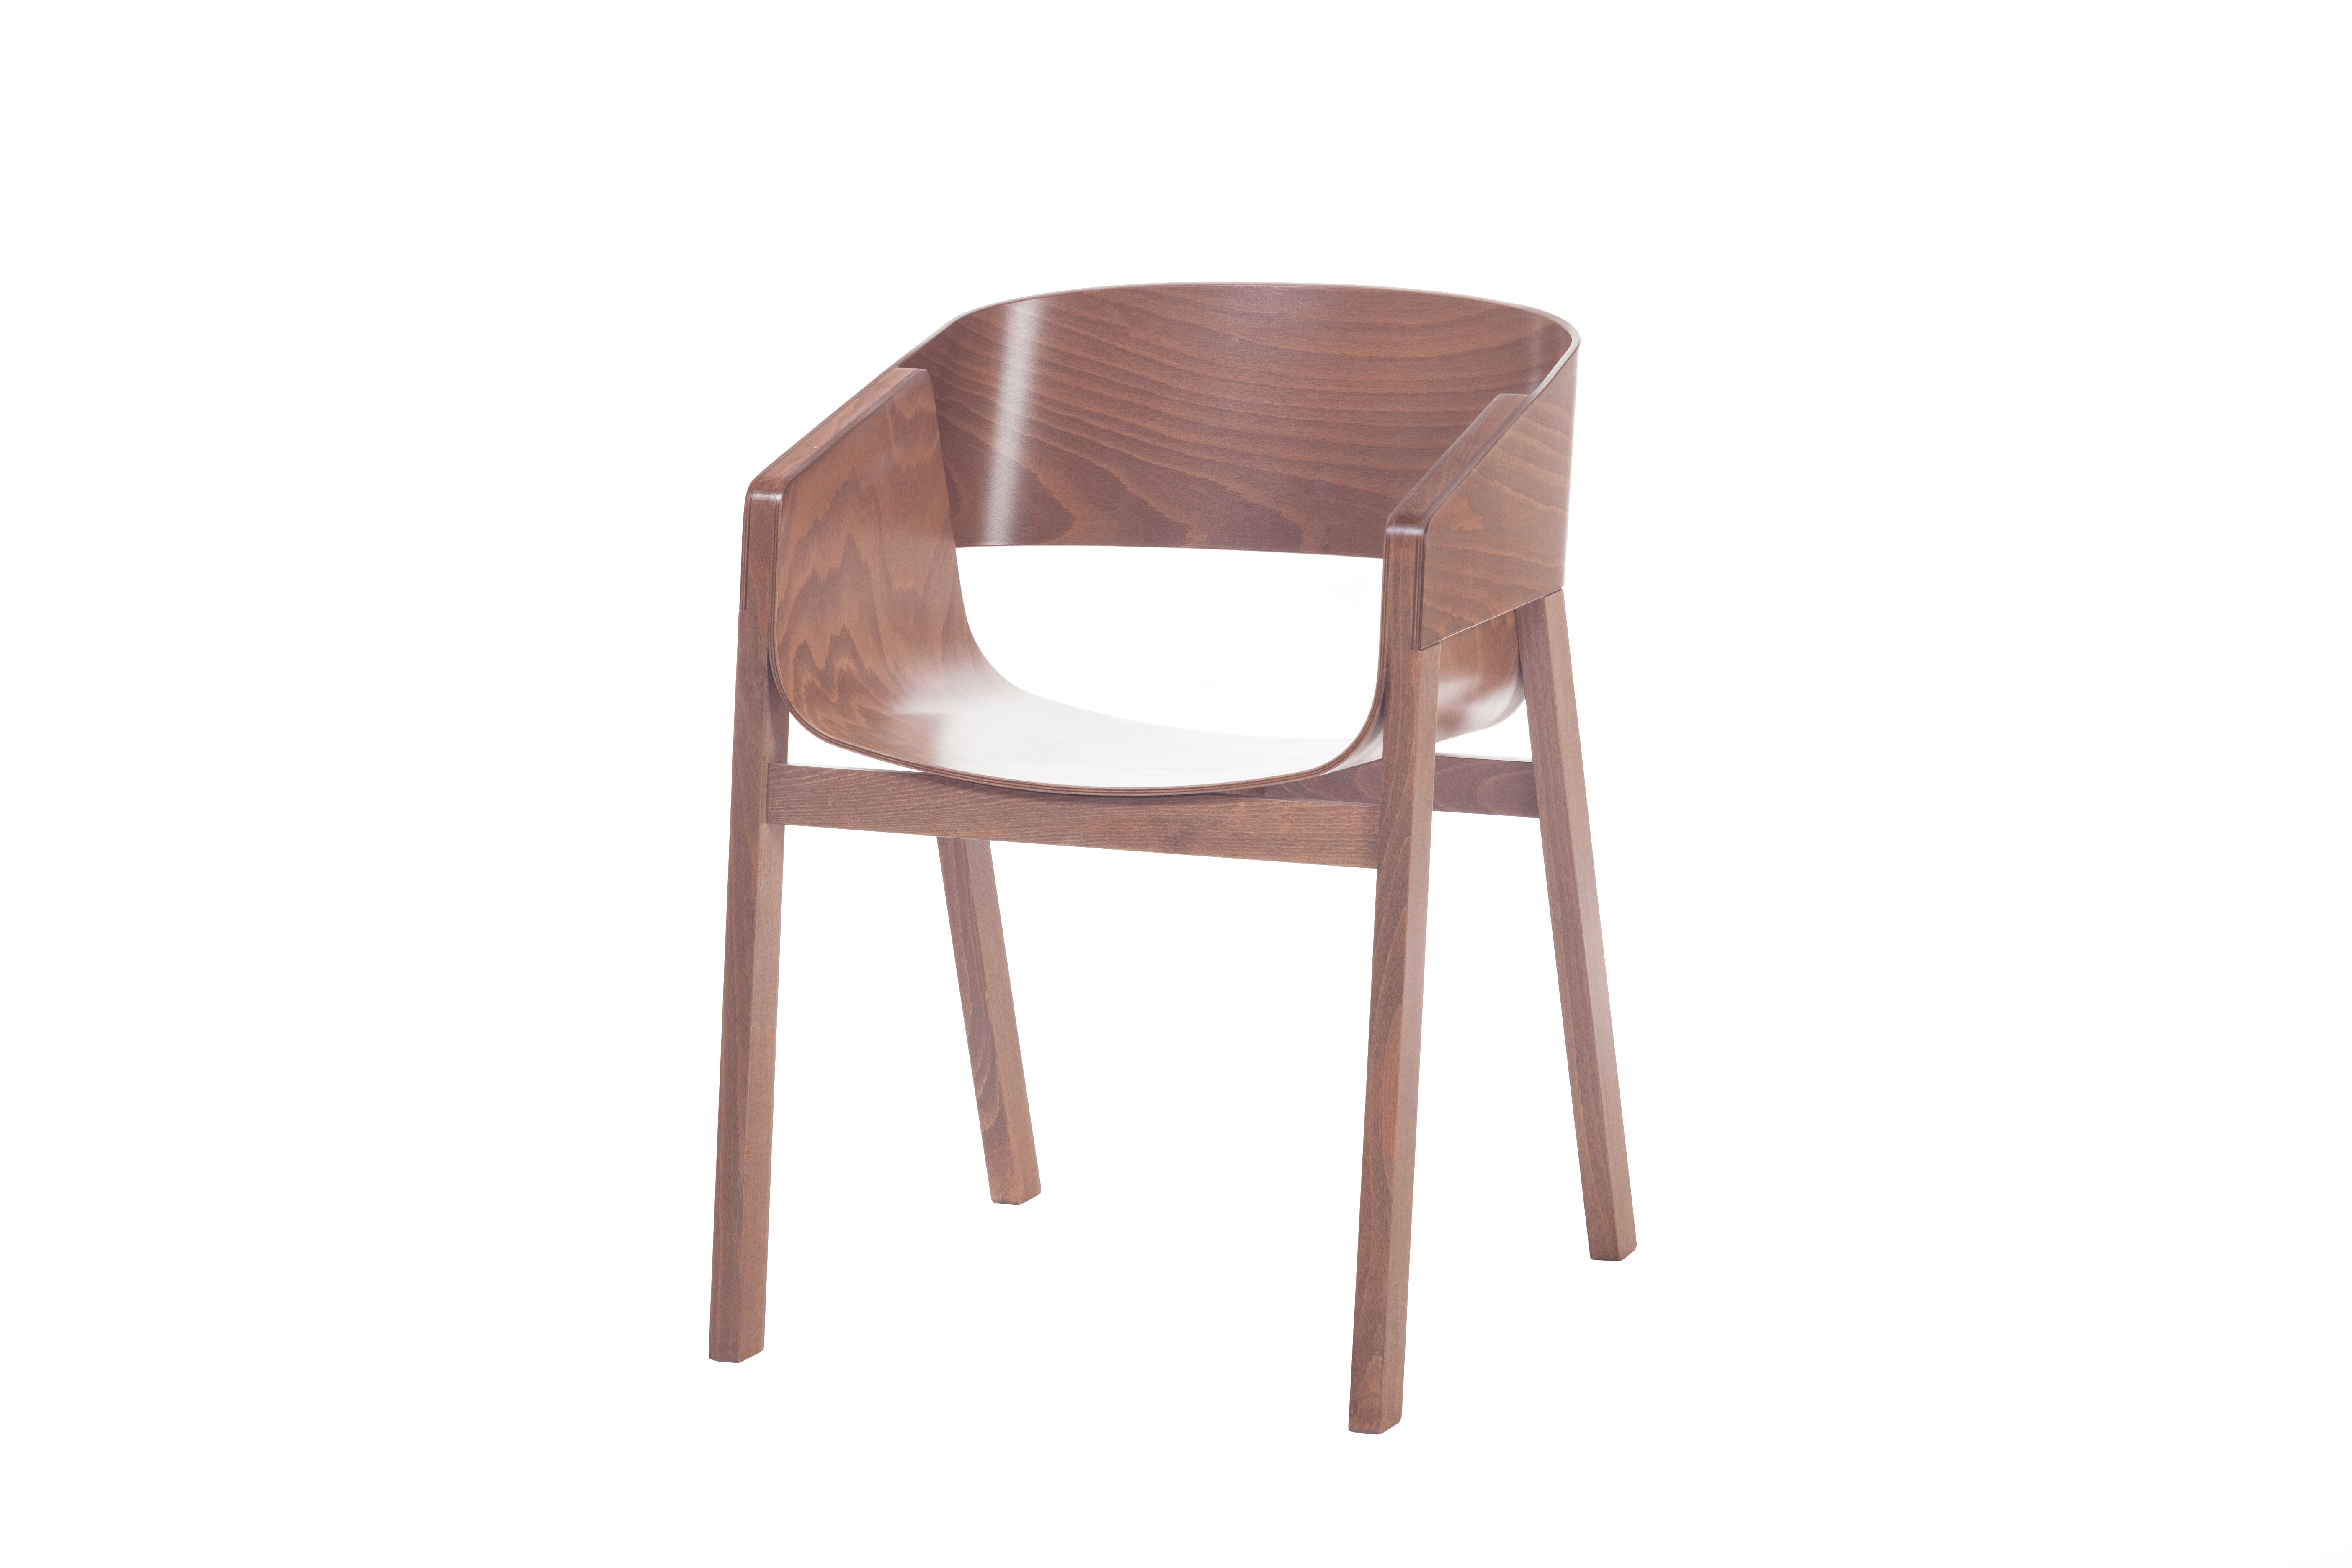 Scaun din lemn de nuc Merano Walnut l475xA39xH78 cm